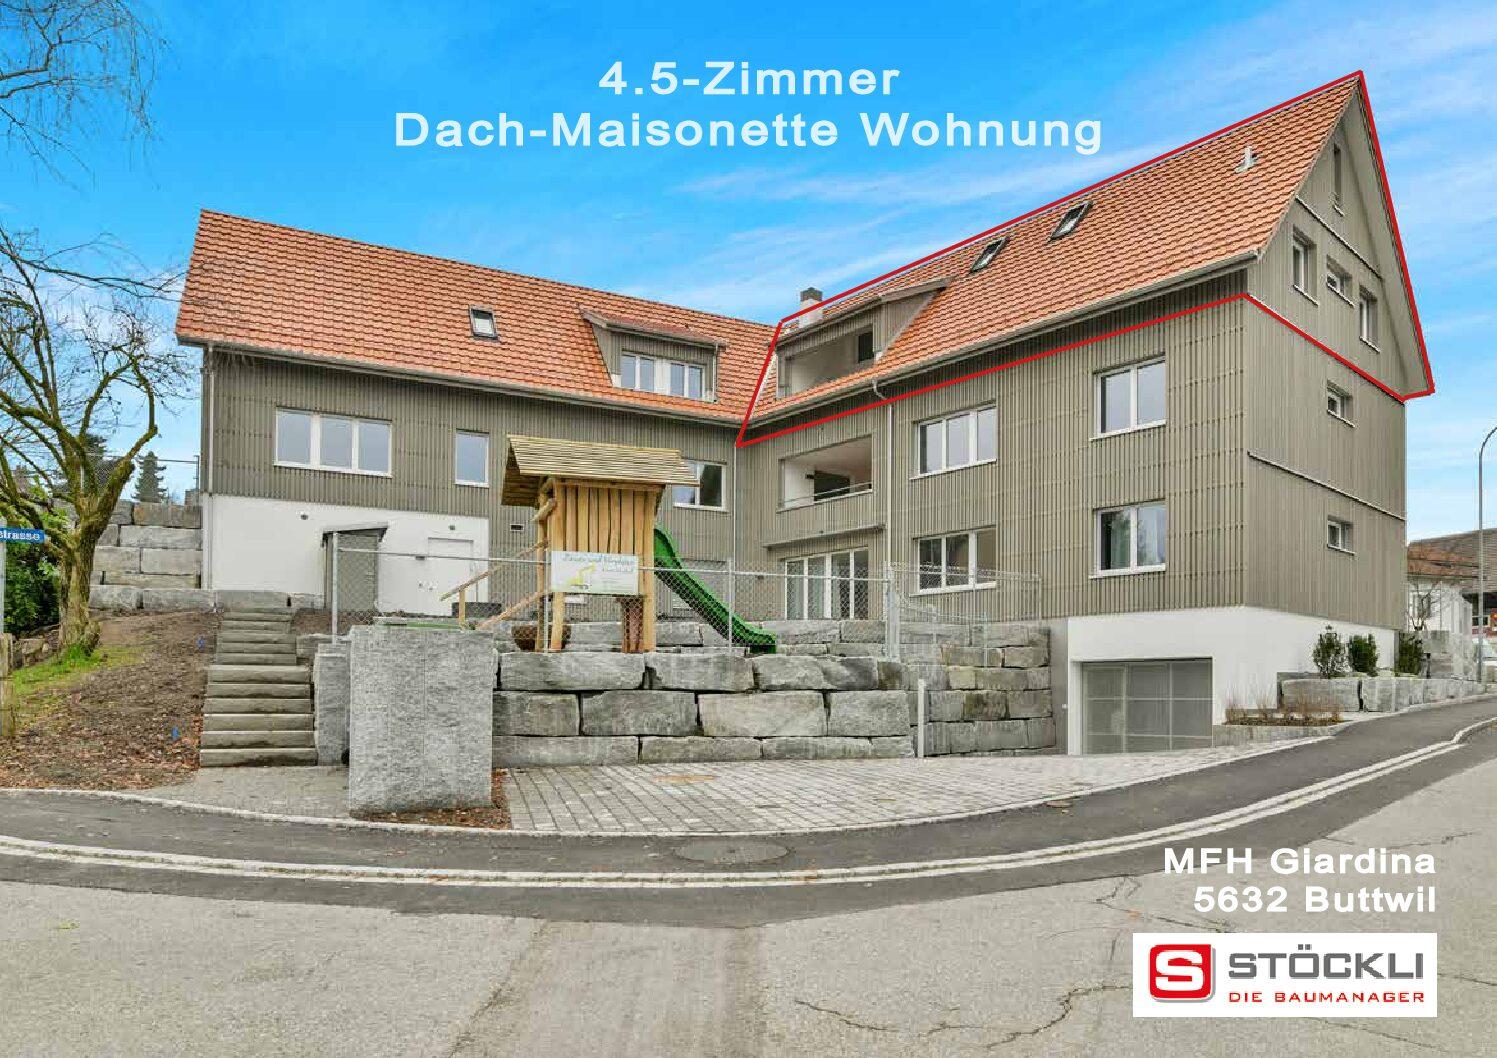 4.5-Zimmer Dach-Maisonettewohnung, Buttwil